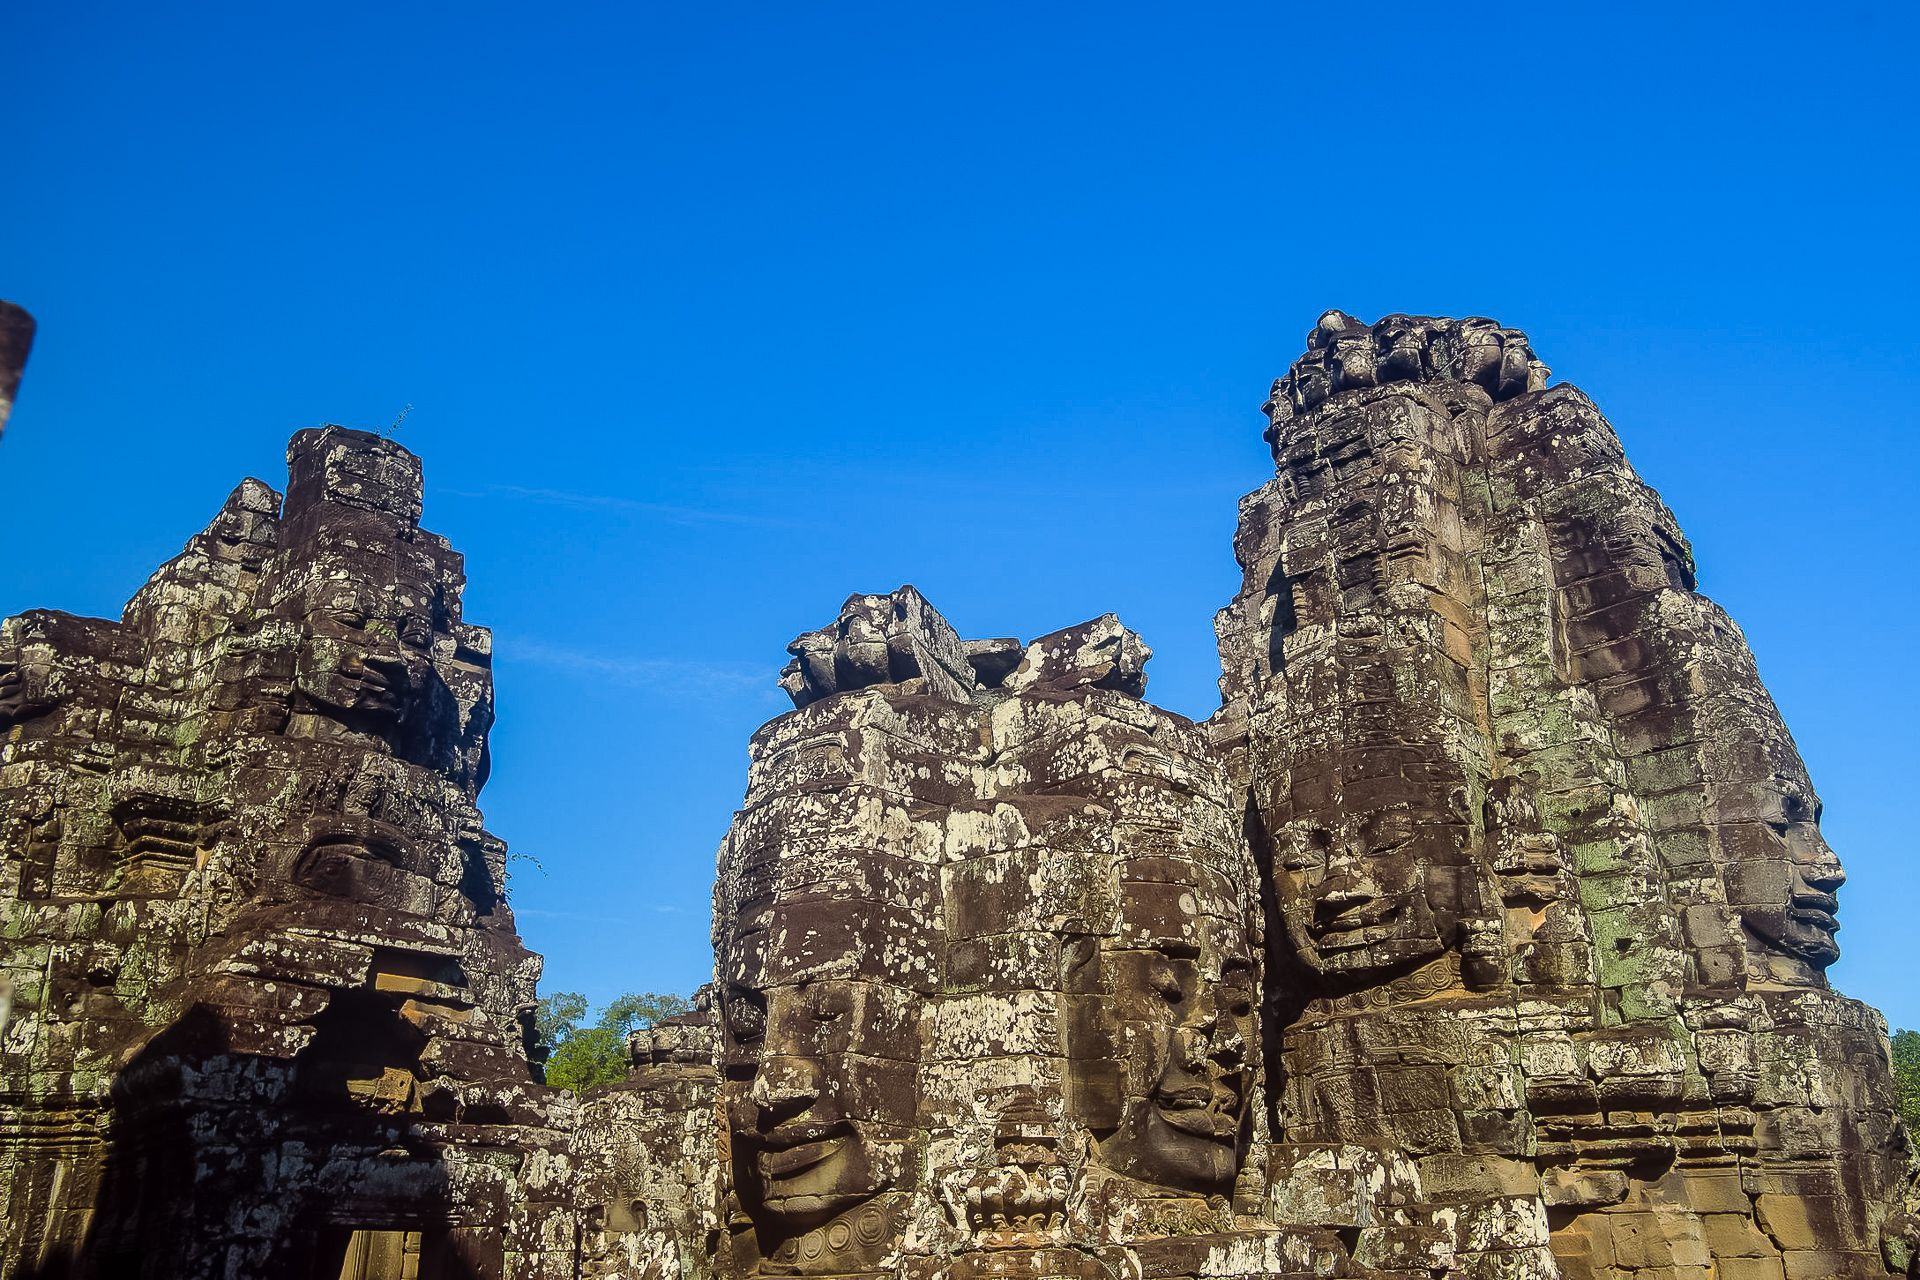 Камбоджа, Сием Рип, Cambodia, Siem Reap, Angkor , Ангкор, храм Байон, многоликие башни